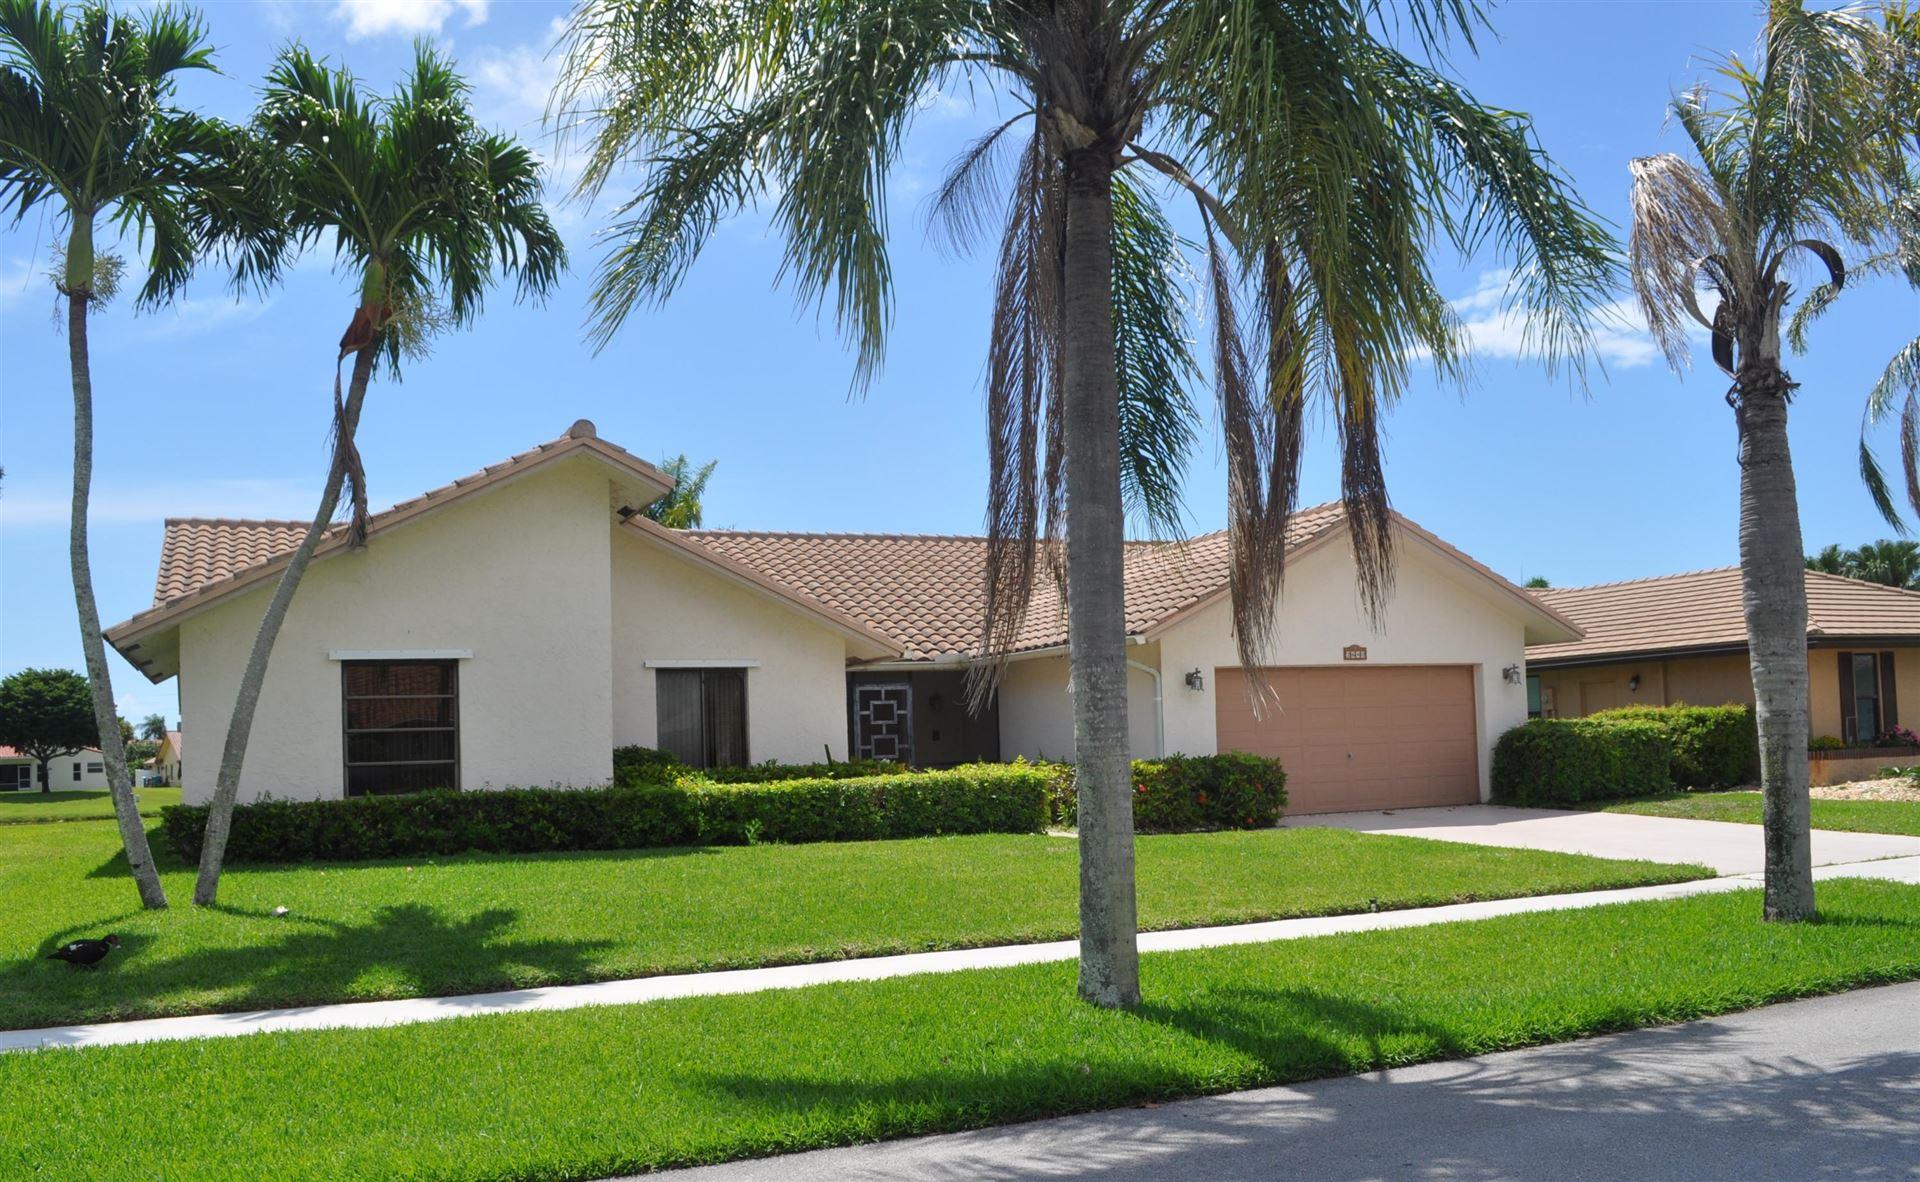 2640 SW 23rd Cranbrook Court, Boynton Beach, FL 33436 - MLS#: RX-10715867